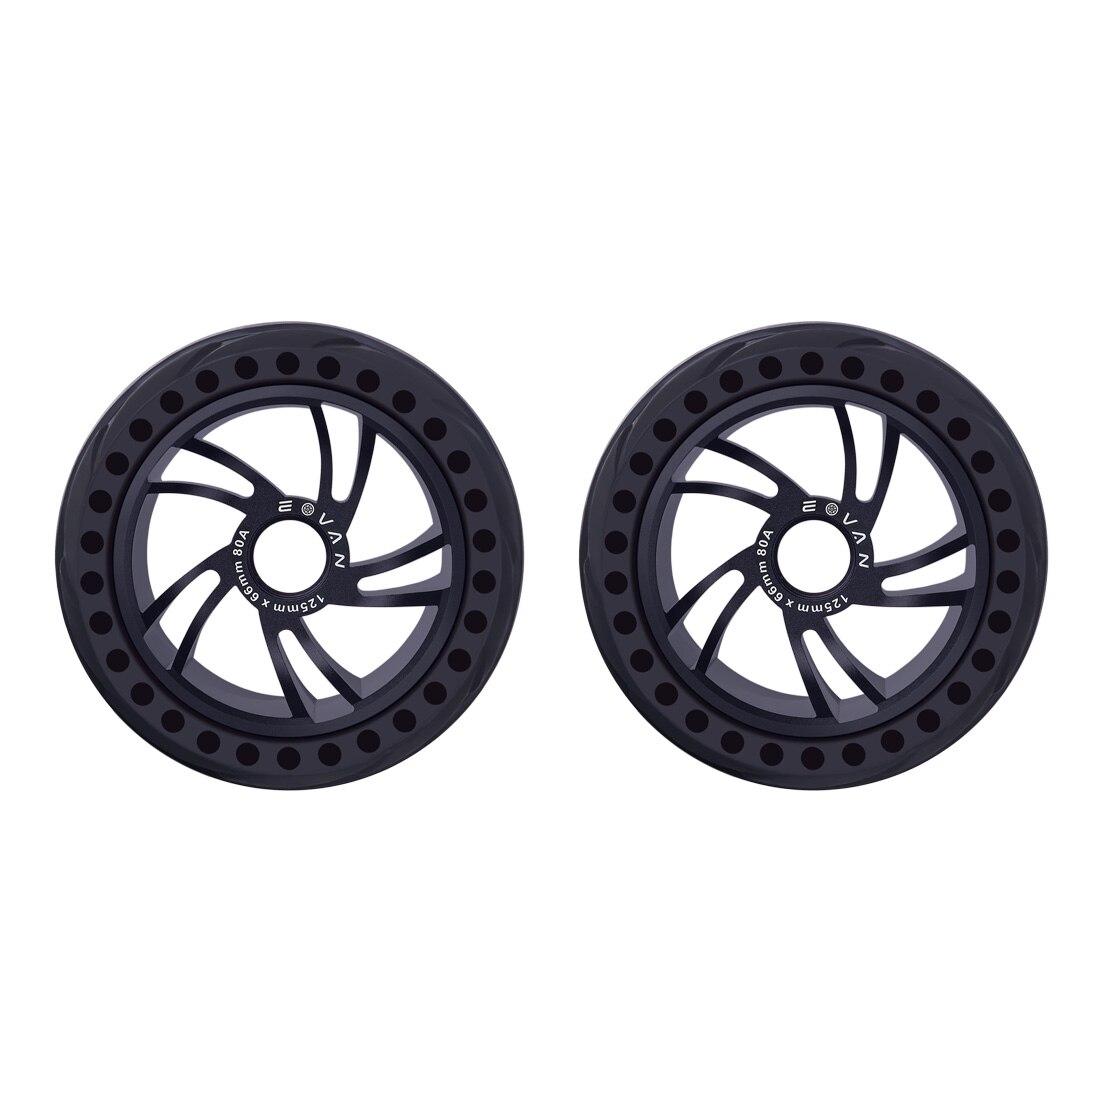 2 uds 125LMH neumáticos de goma todoterreno-Negro